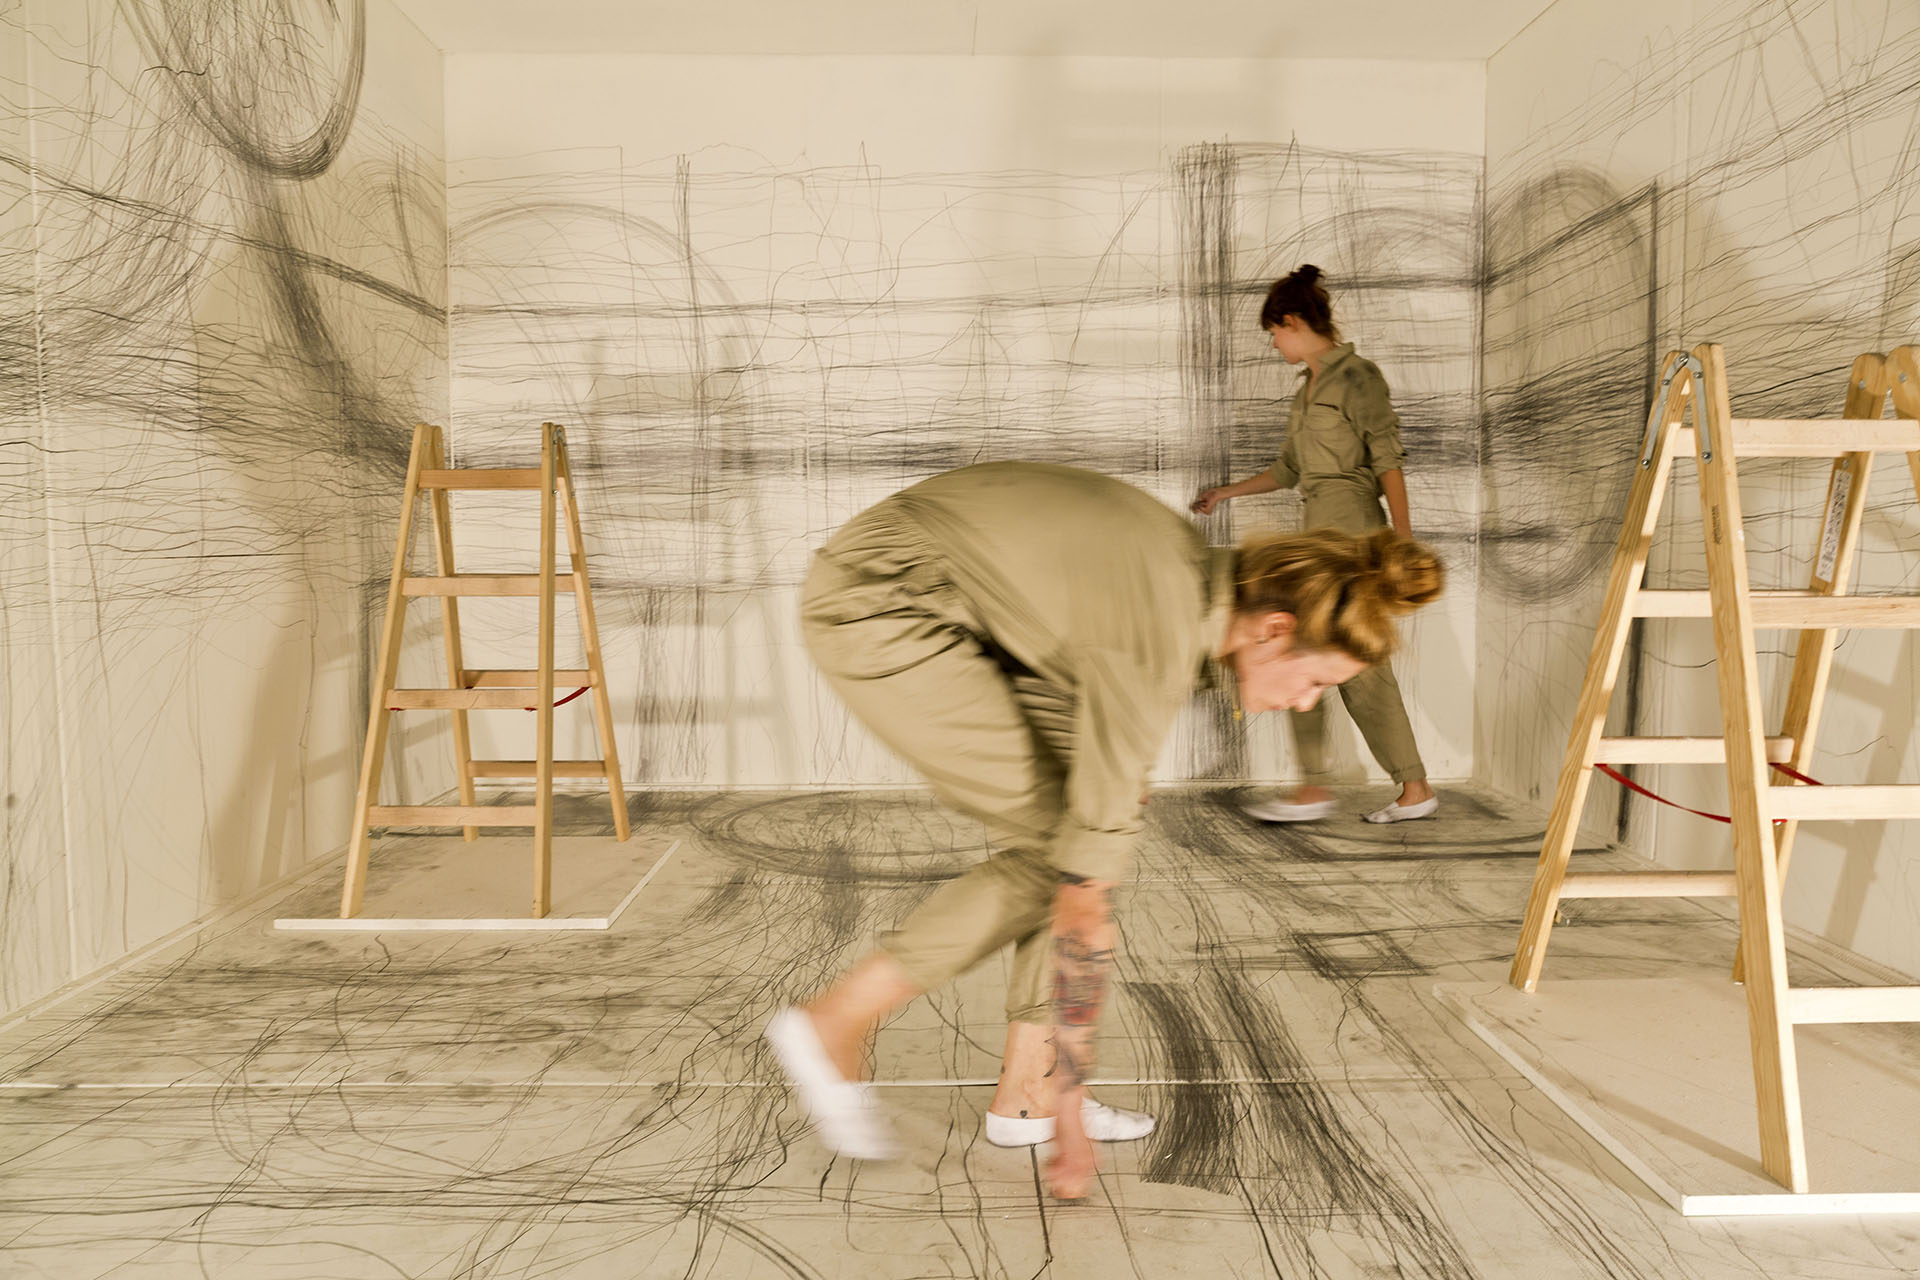 © HSLU Kunst & Design Werkschau / K&V Furer / Aebi